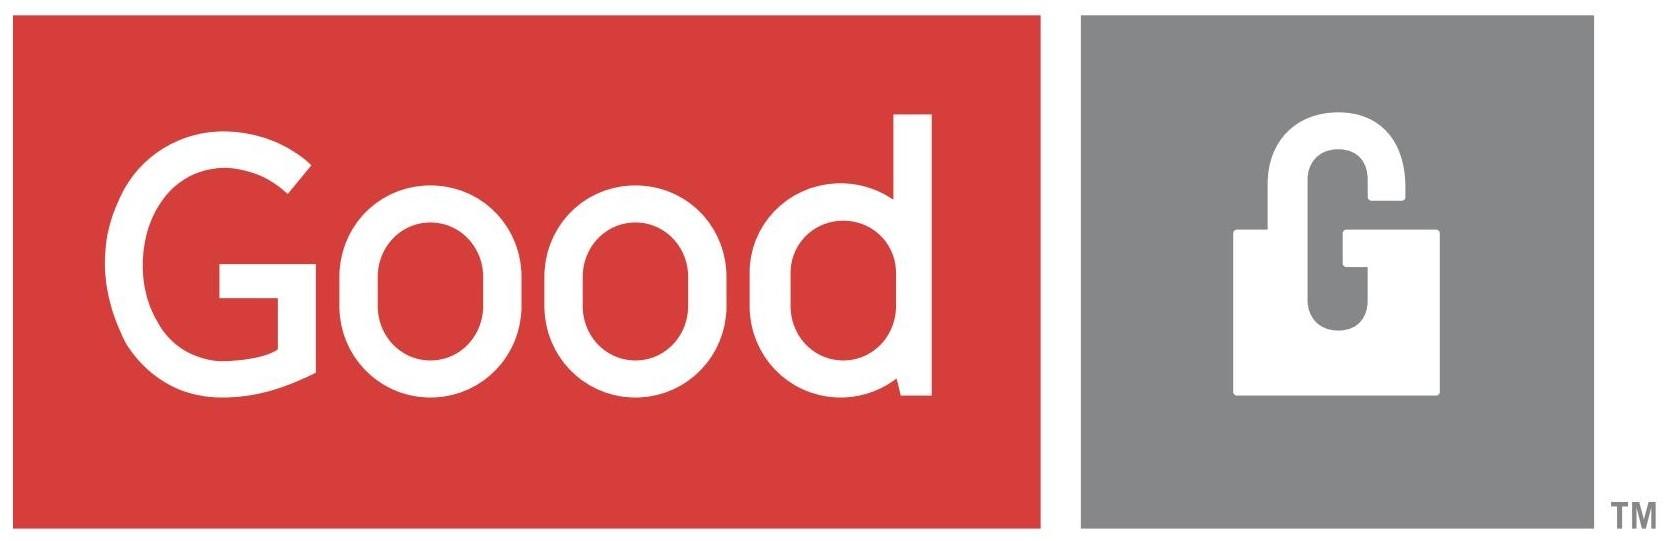 good-technology-logo